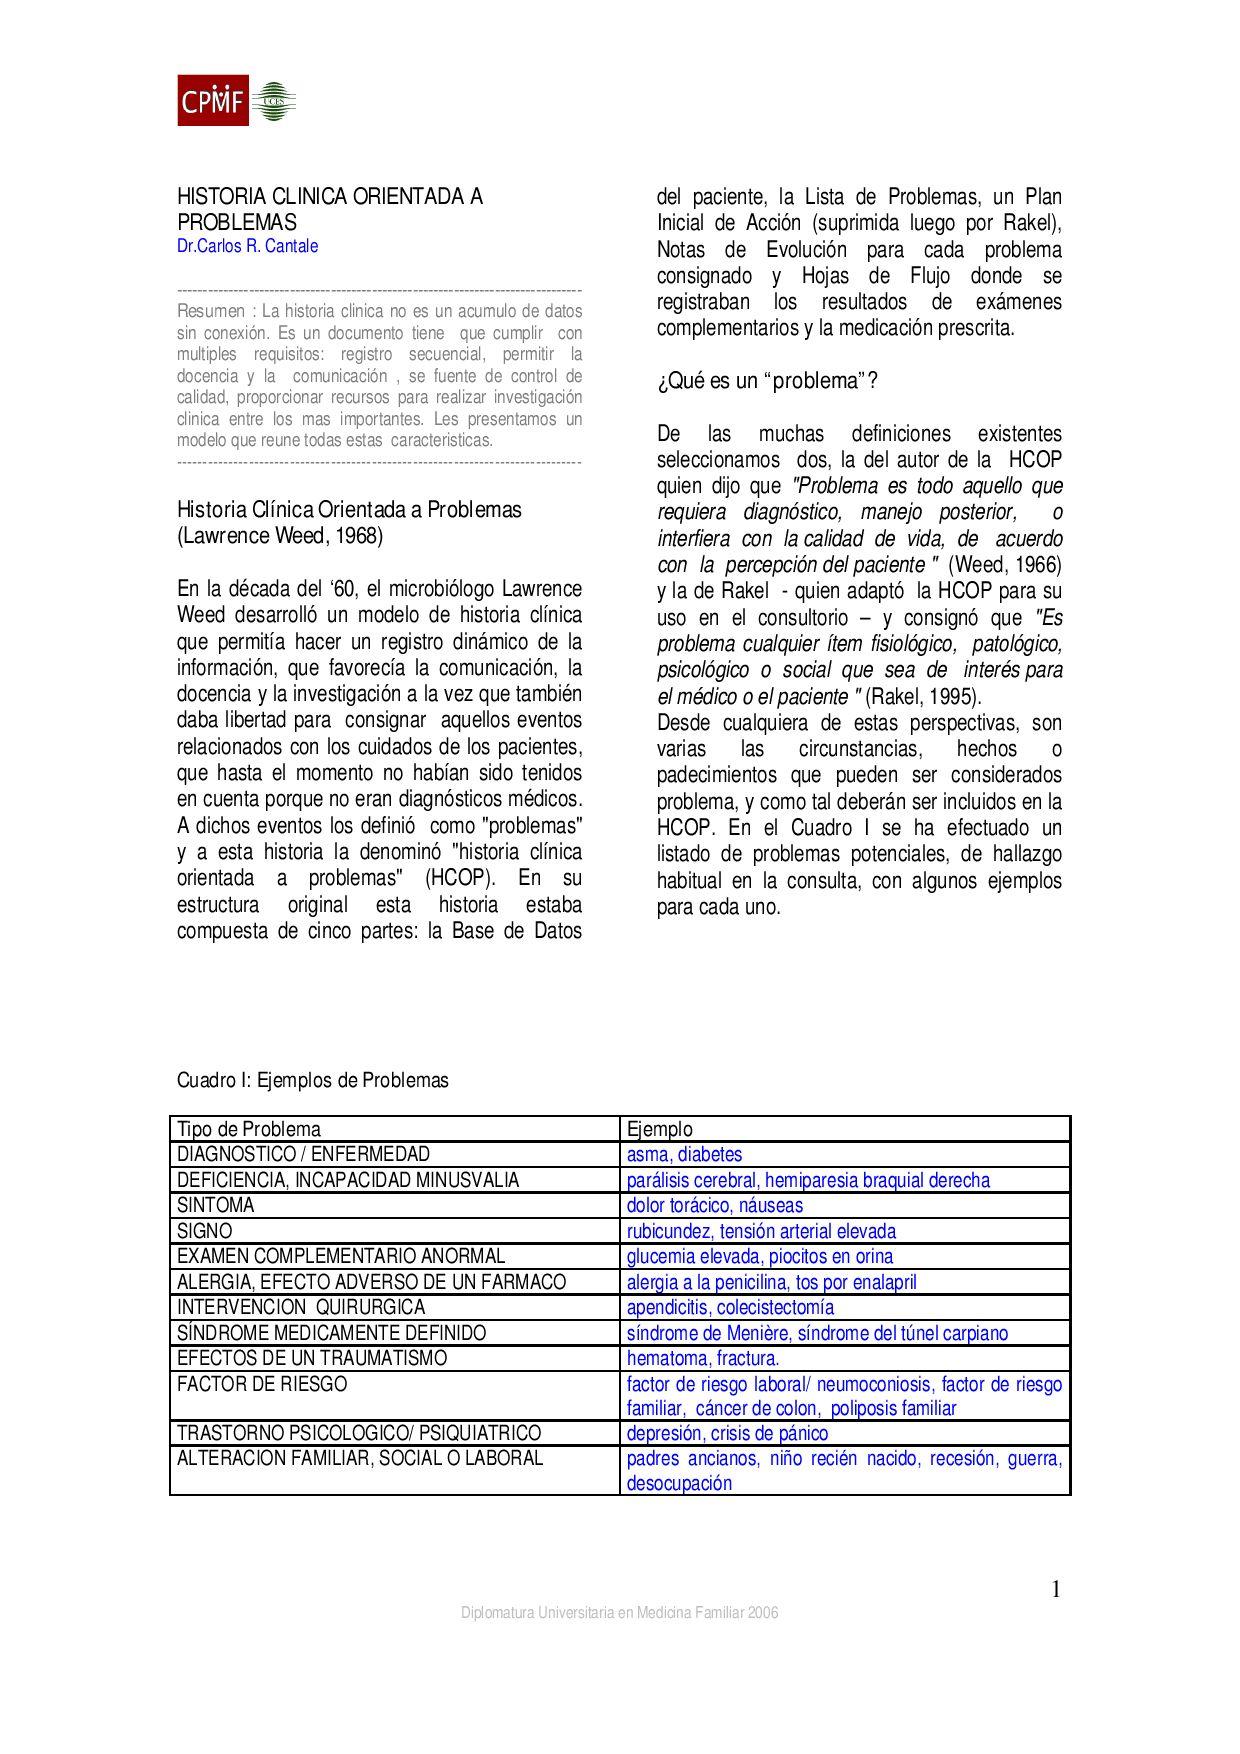 Historia Clinica Orientada a Problemas by Ruben Roa - issuu